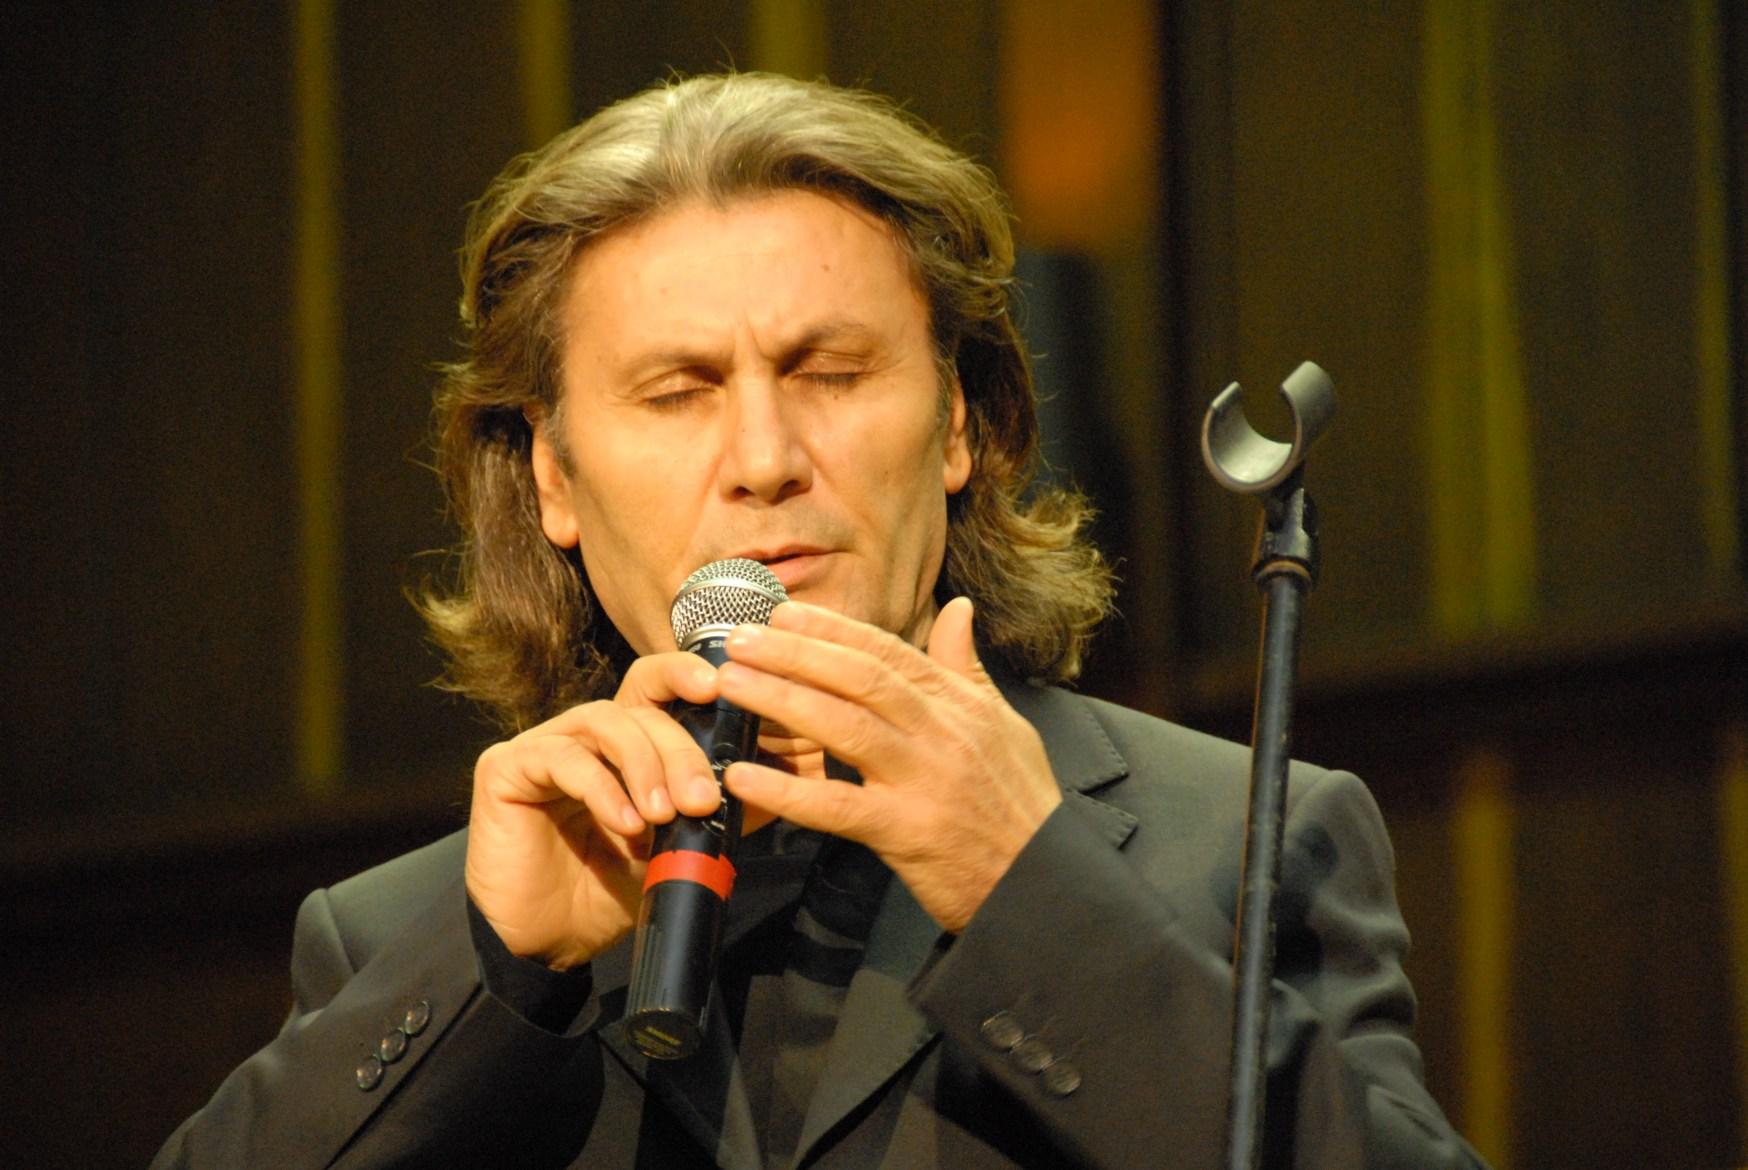 Hasan Yükselir singt mir geschlossenen Augen in ein Mikrofon